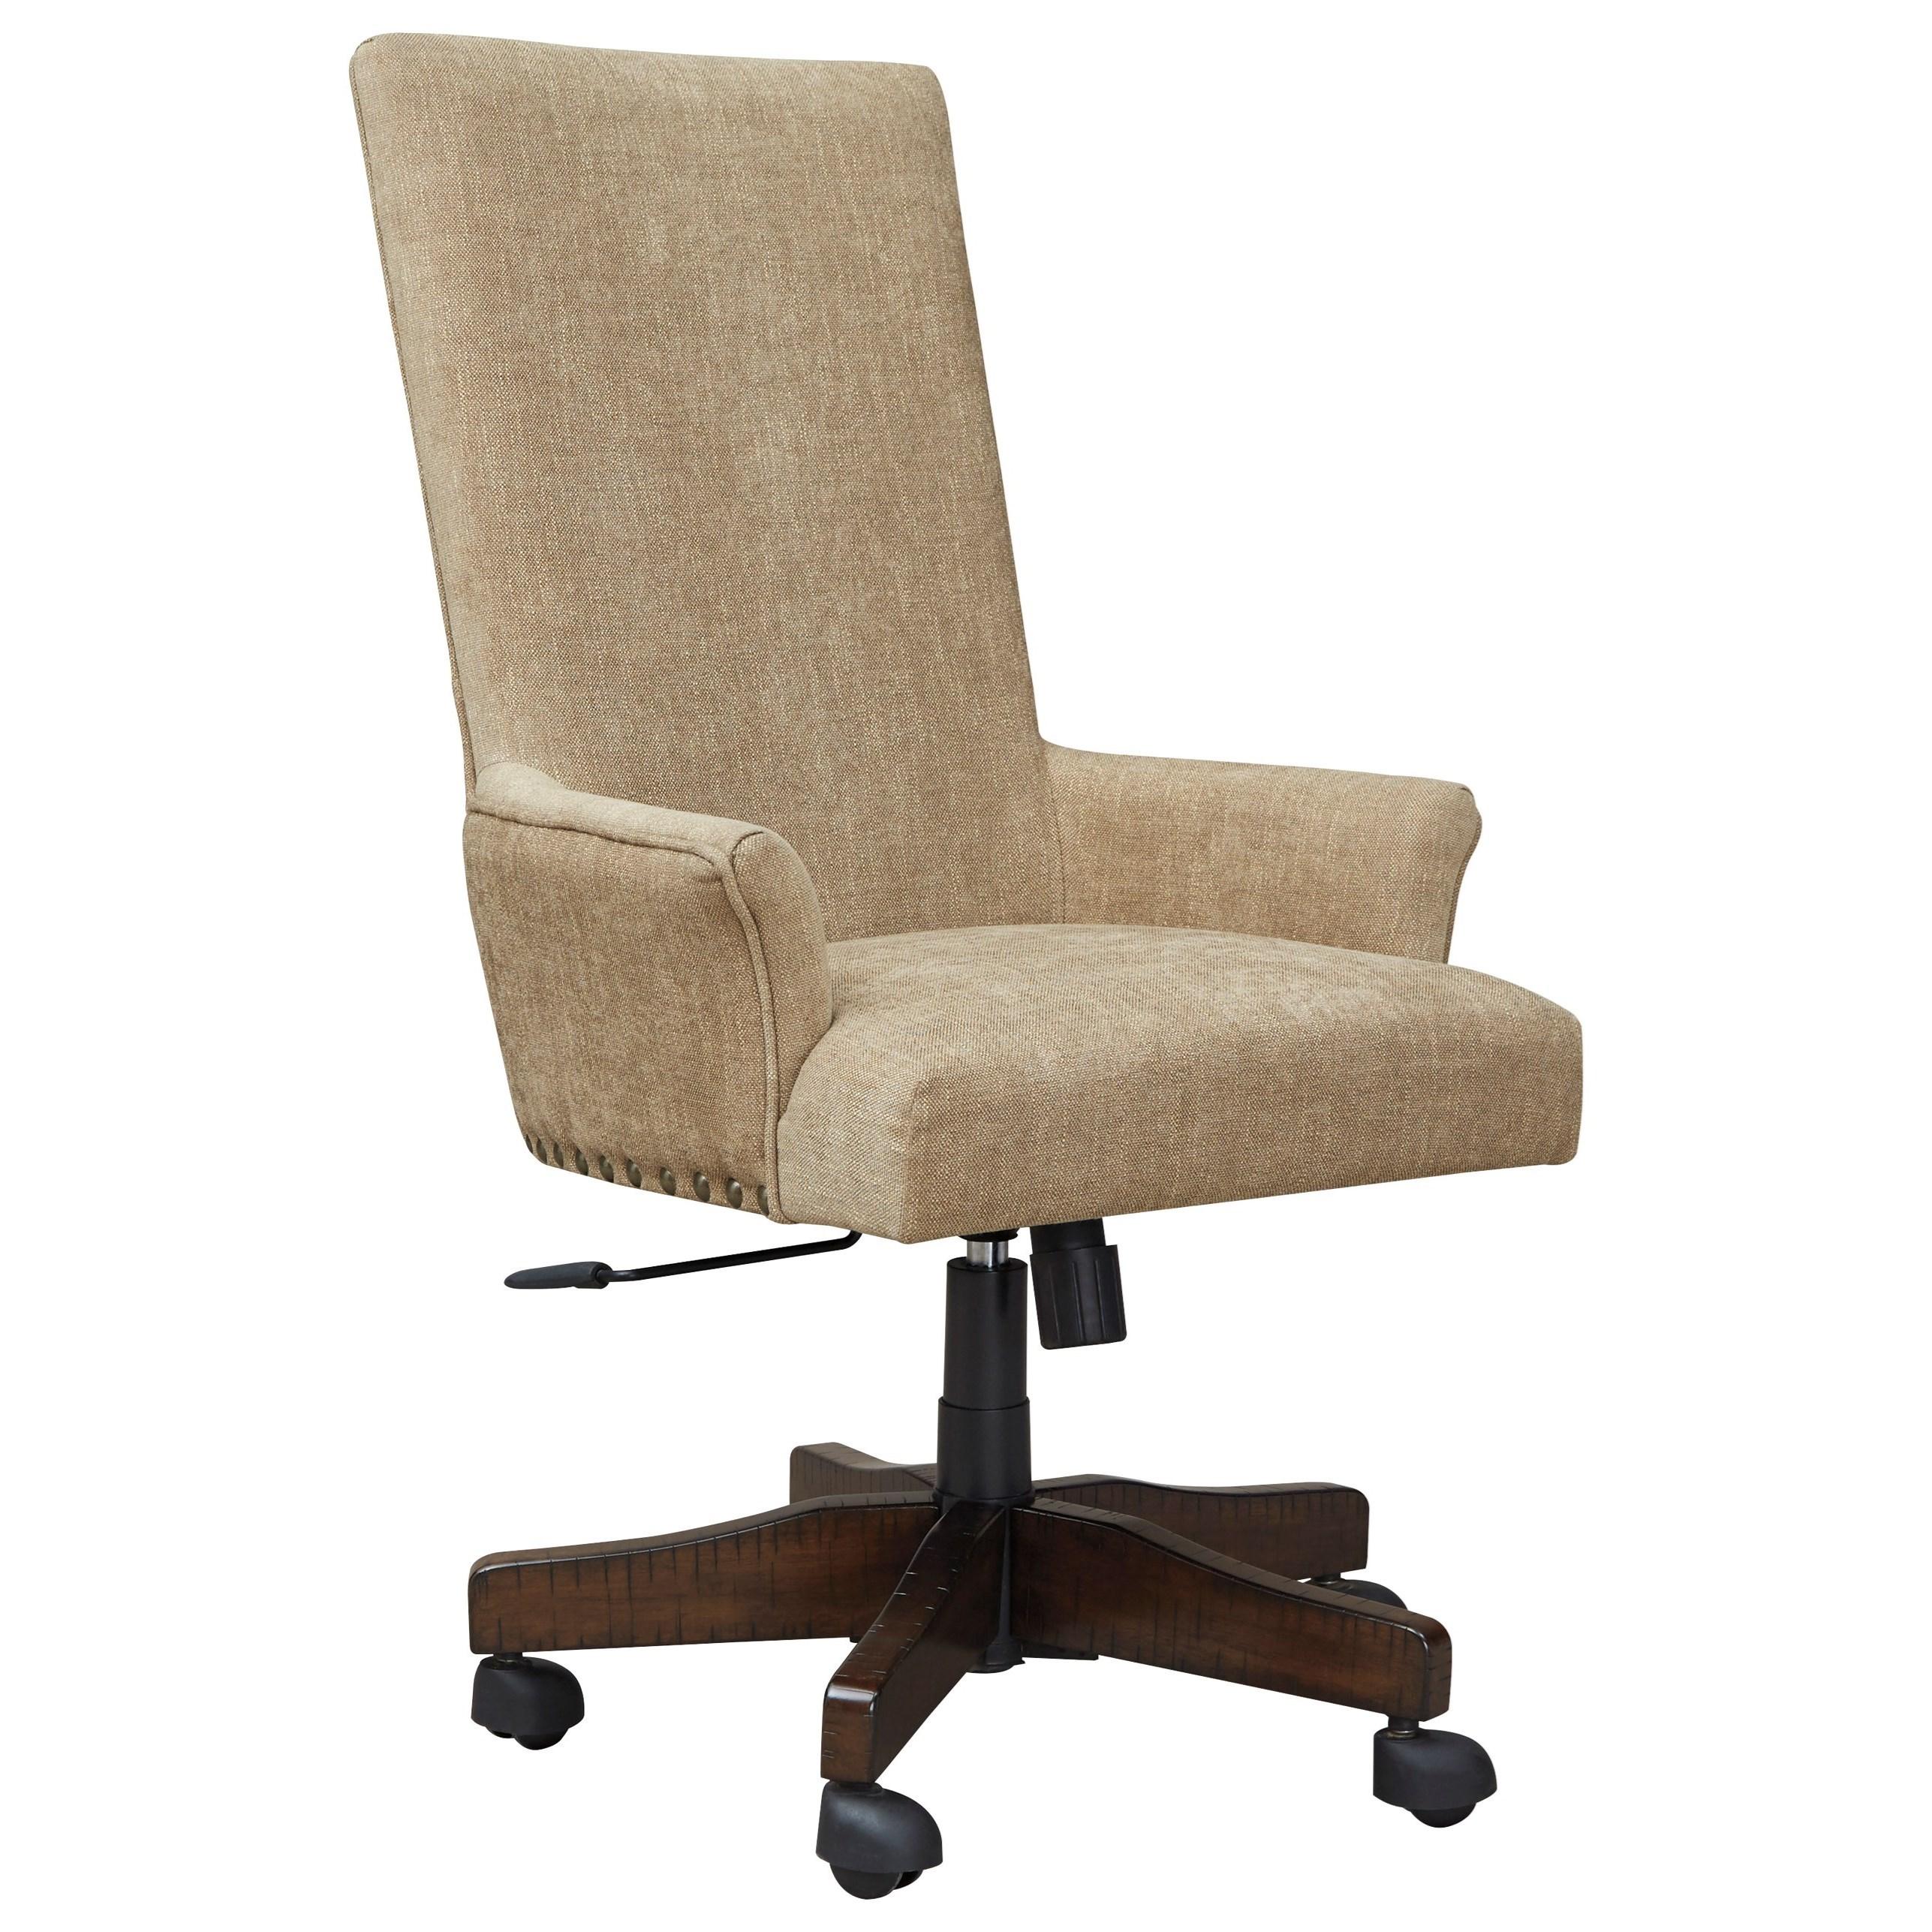 Baldridge Upholstered Swivel Desk Chair by Ashley (Signature Design) at Johnny Janosik